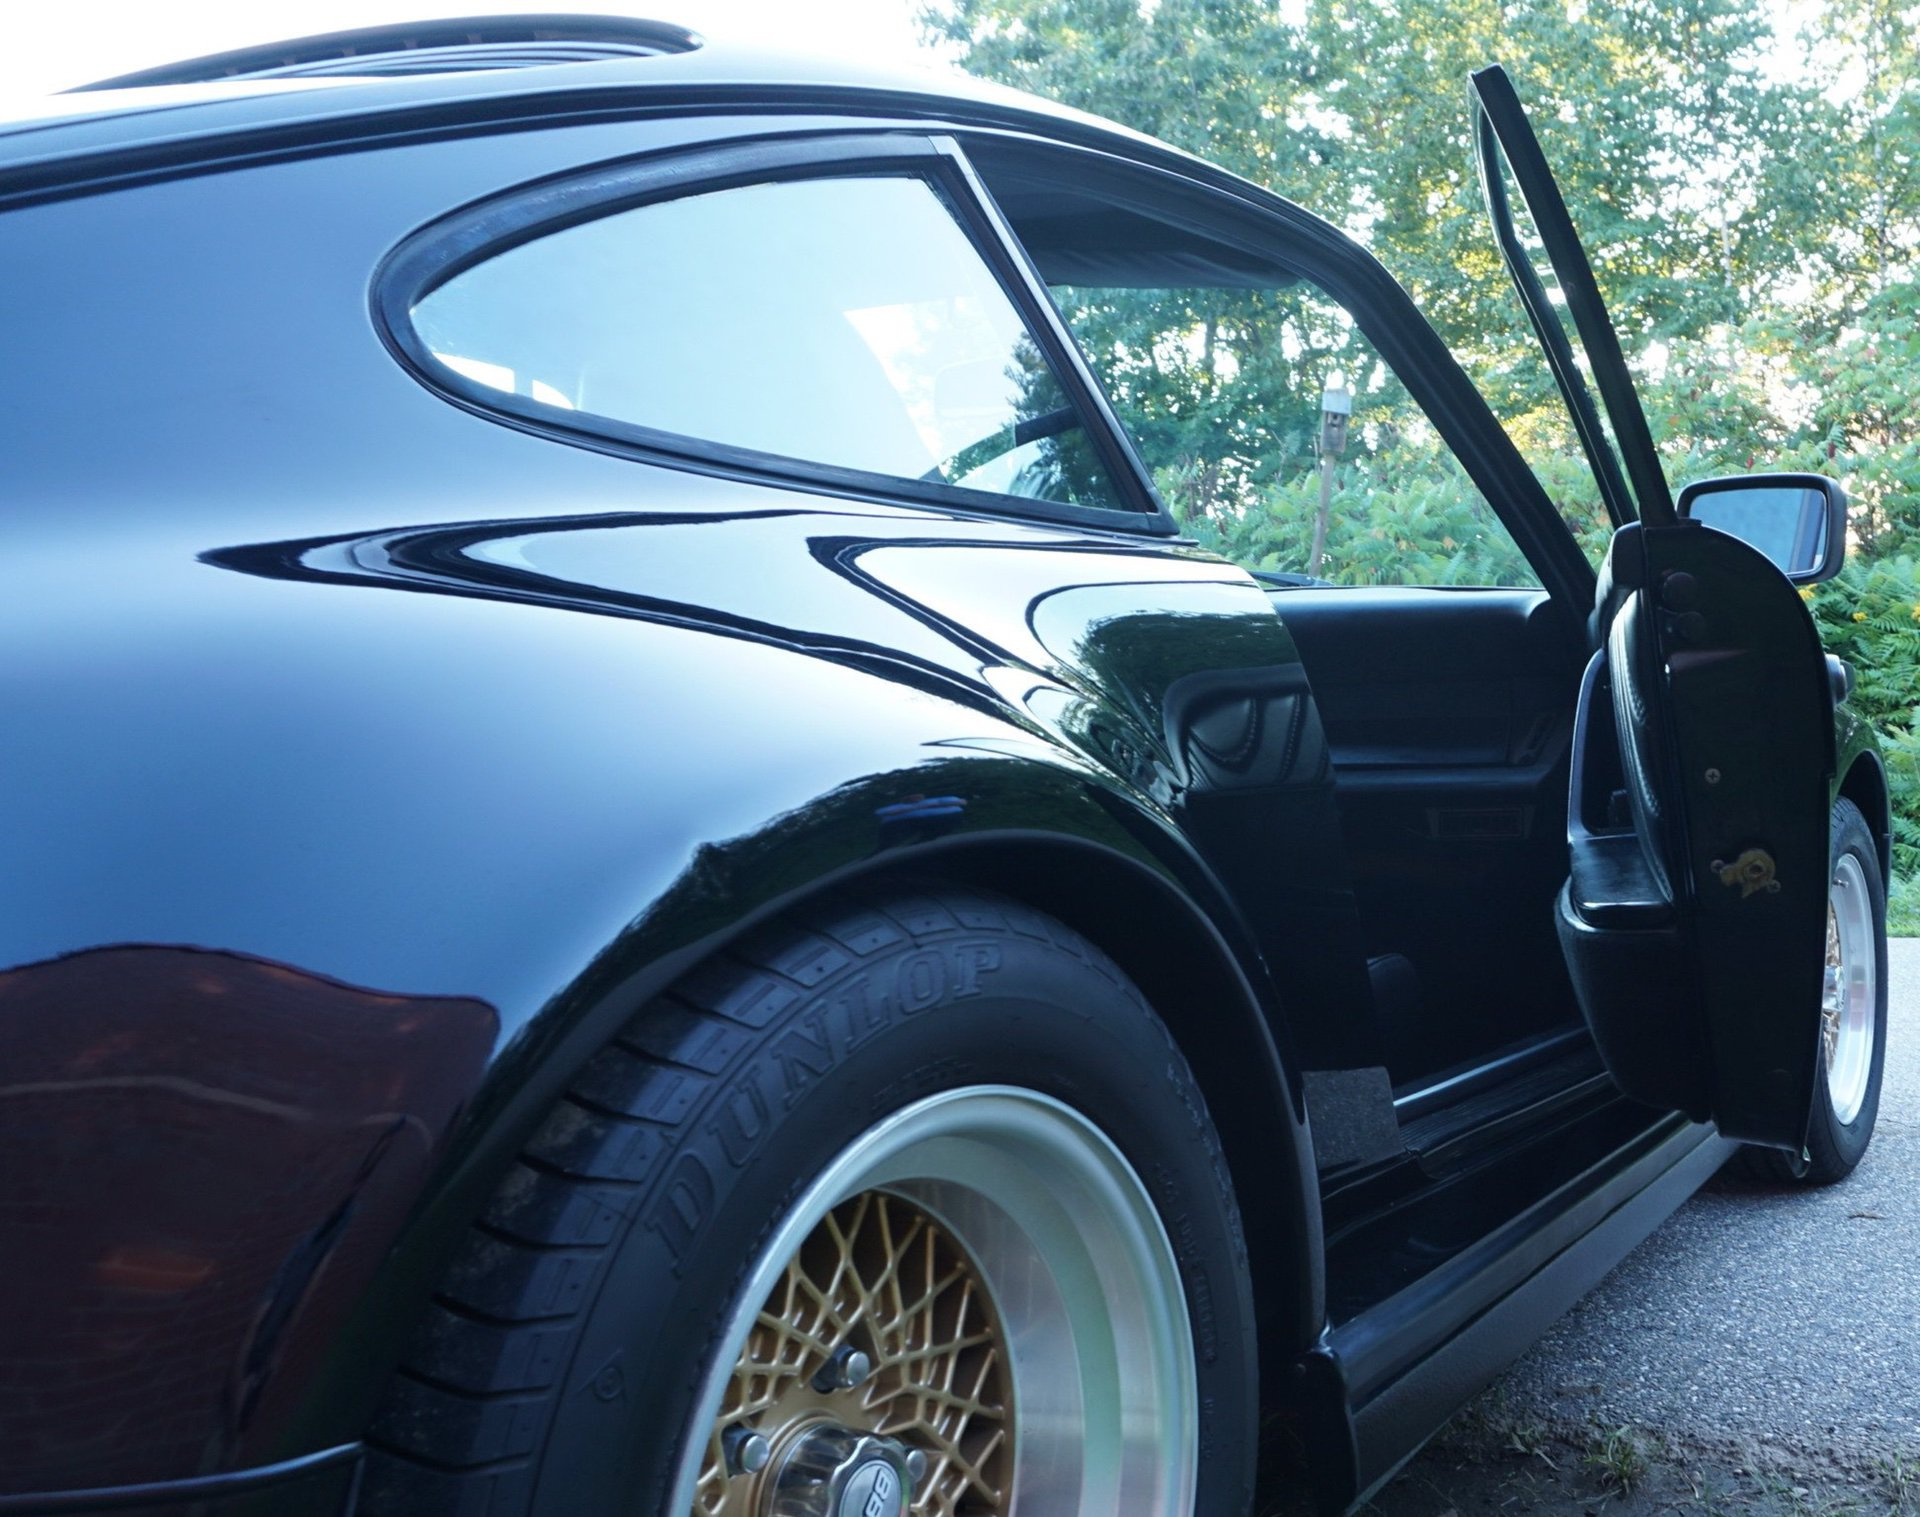 Porsche_930_Turbo_Slantnose_0010